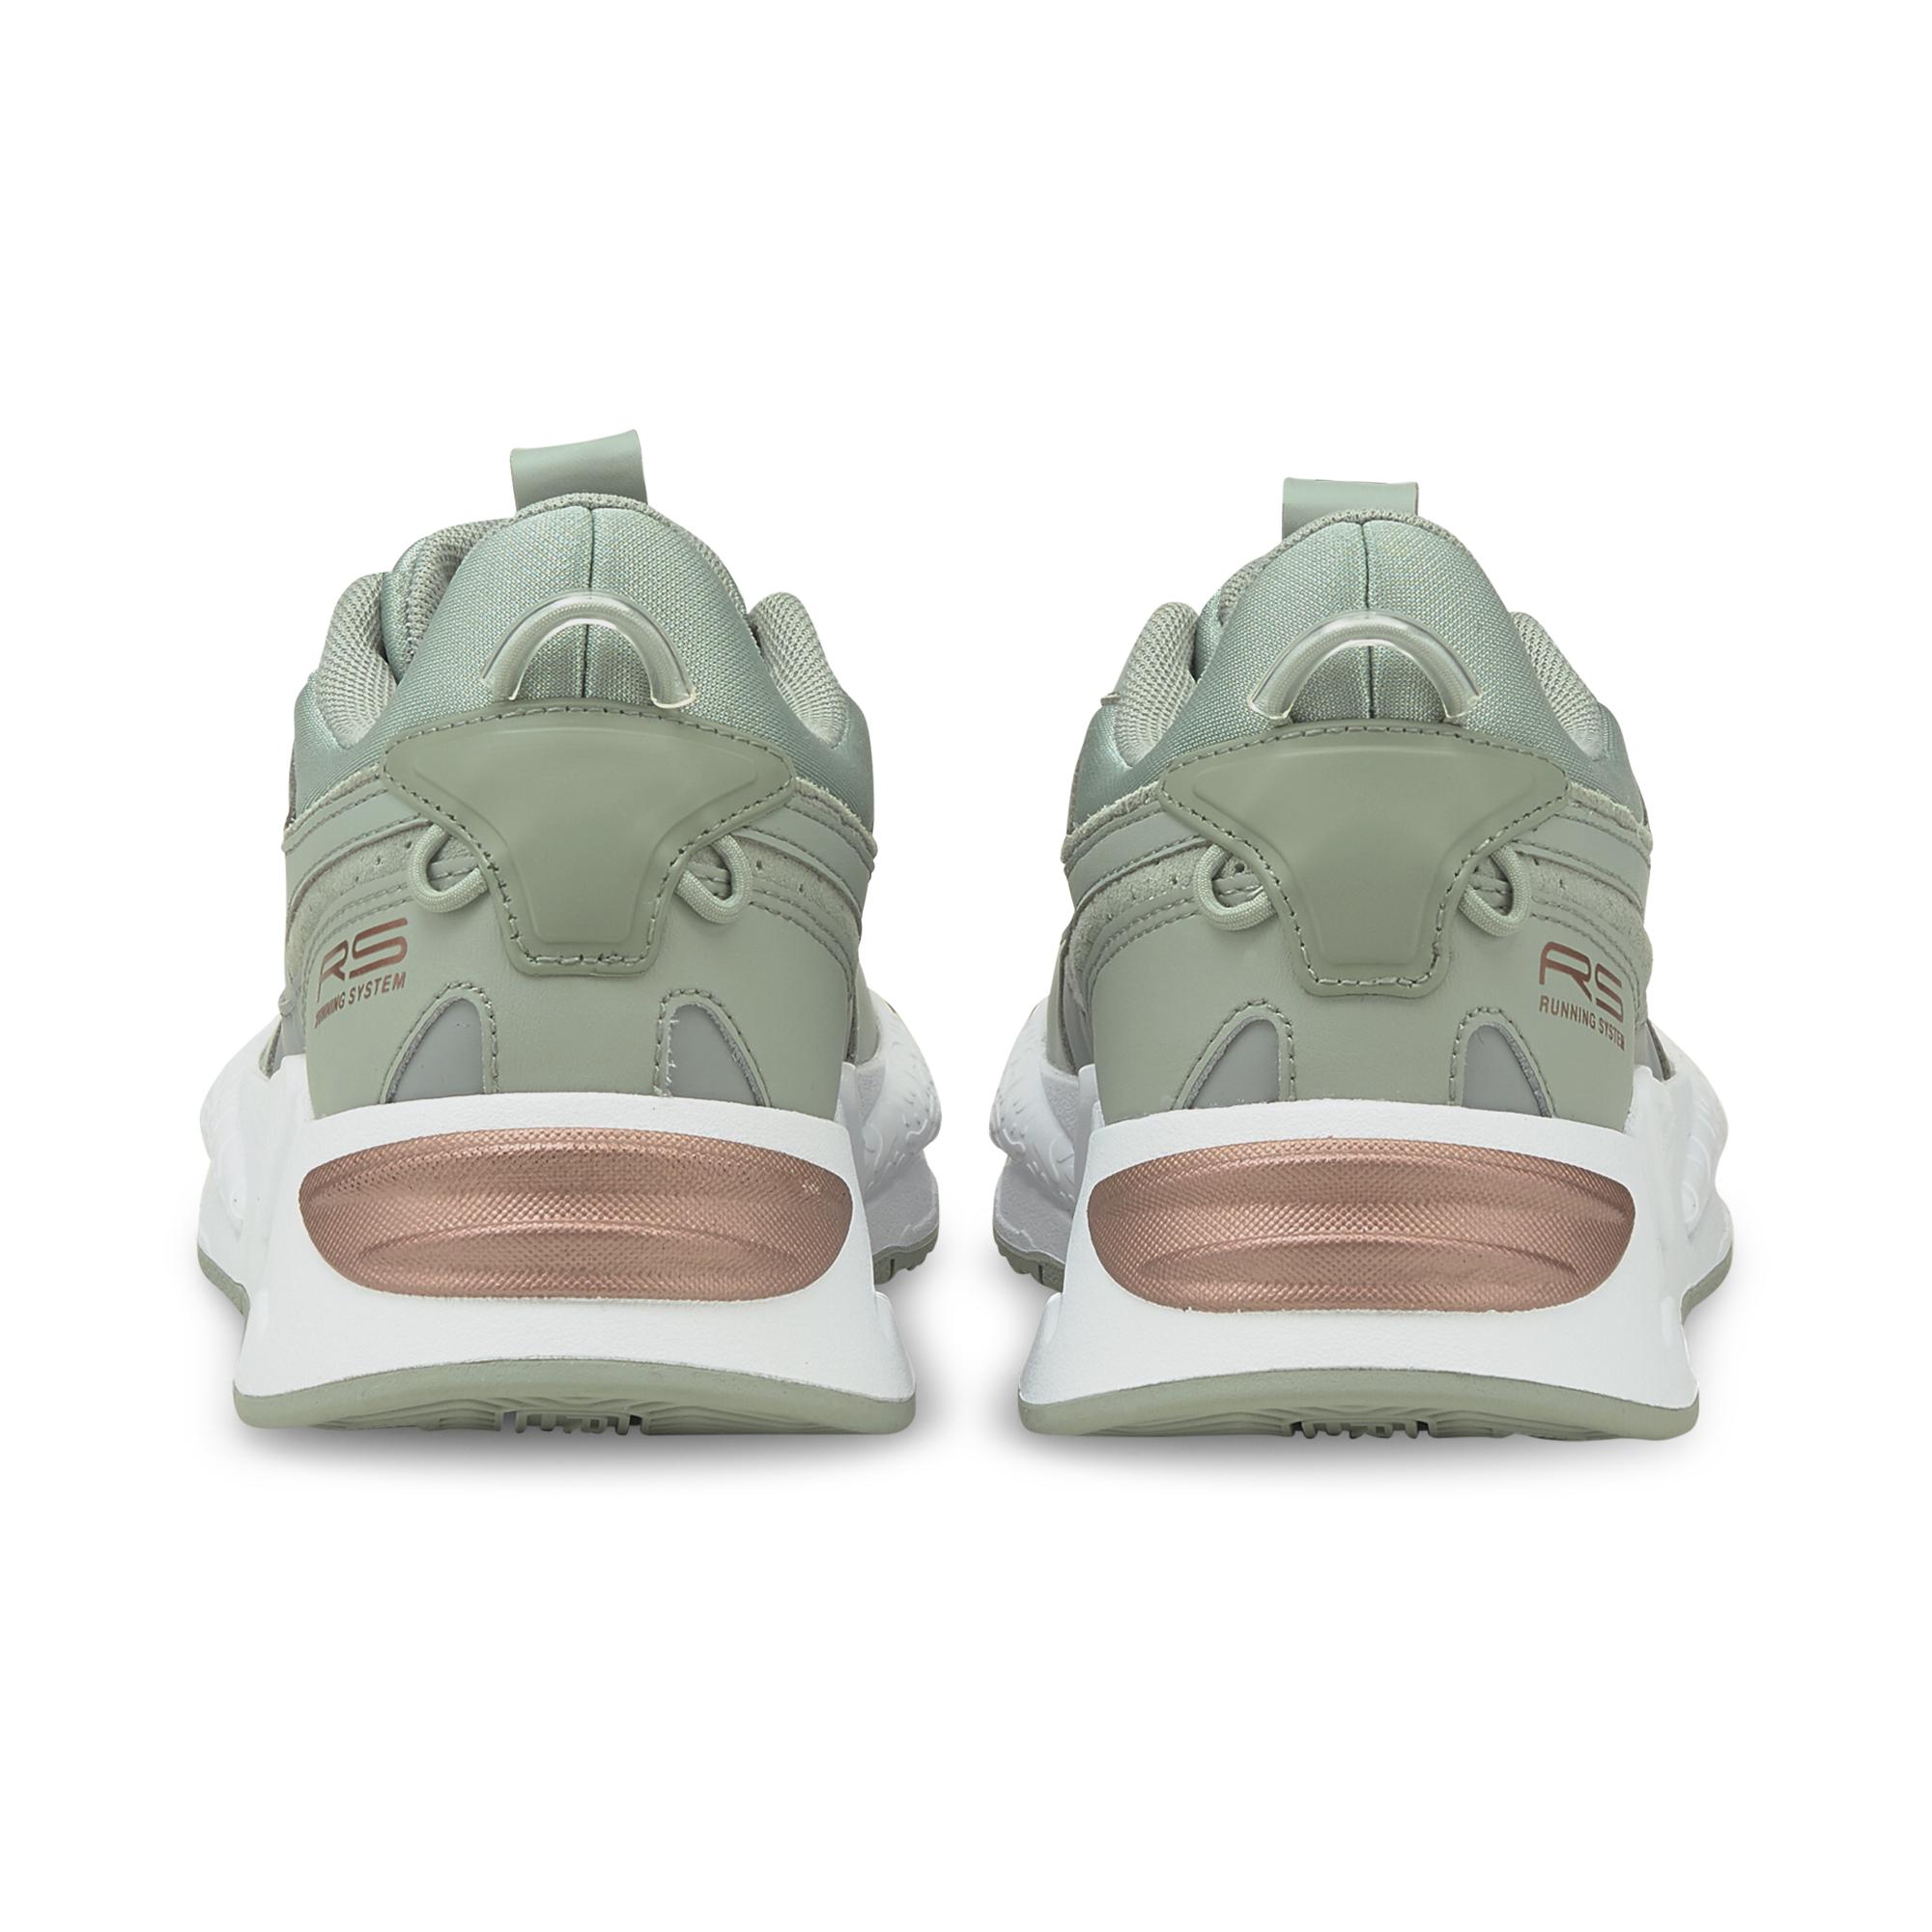 Puma RS-Z Reflective Wn's sneakers, jadeite, 42